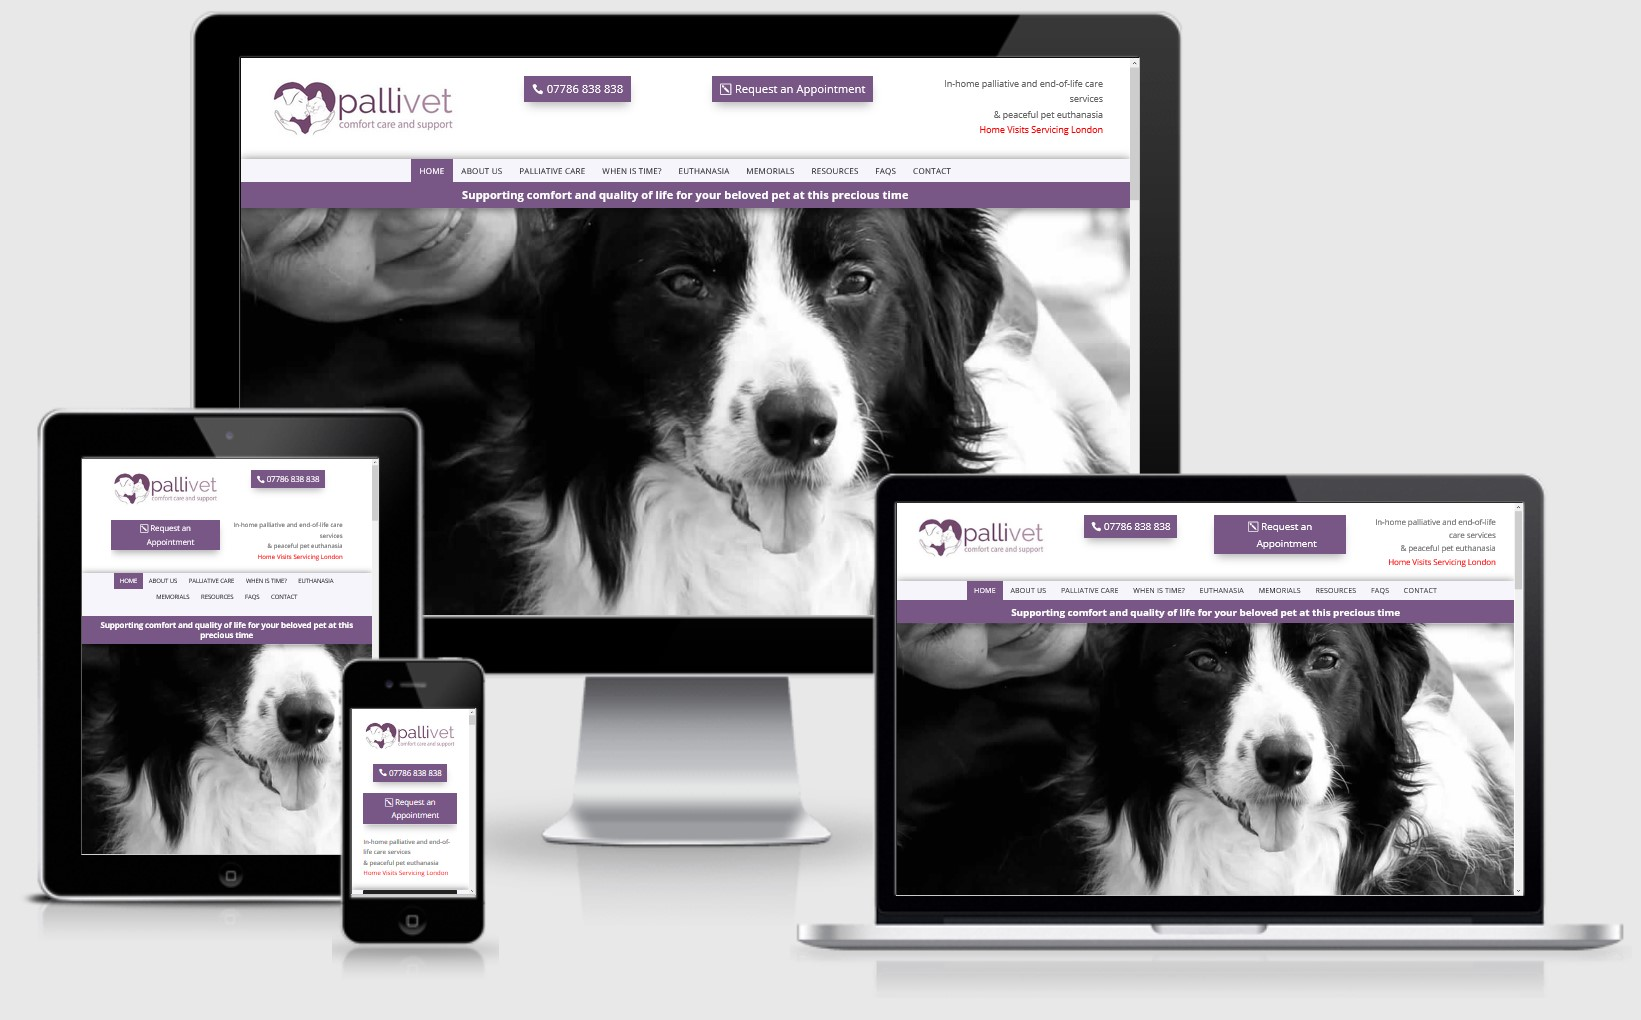 Pallivets London Website